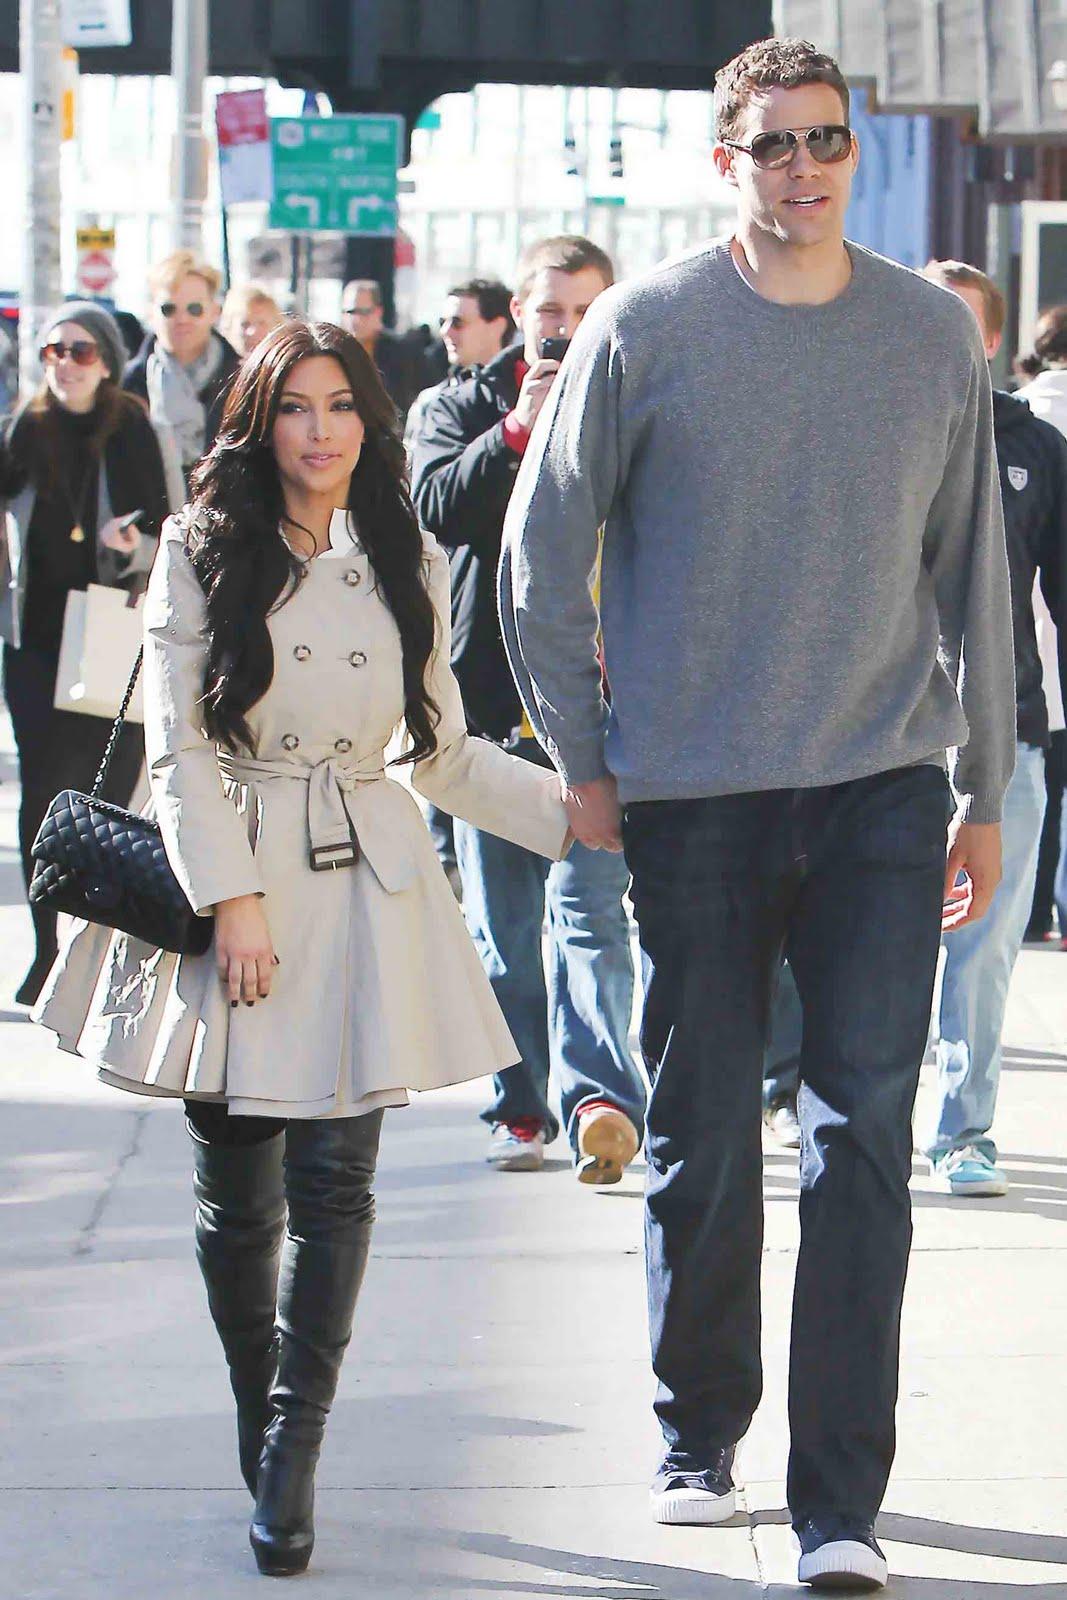 Kehidupan awal Kardashian lahir di Los Angeles California putri dari Robert Kardashian dan Kris Jennernée Houghton Kardashian mempunyai seorang kakak perempuan